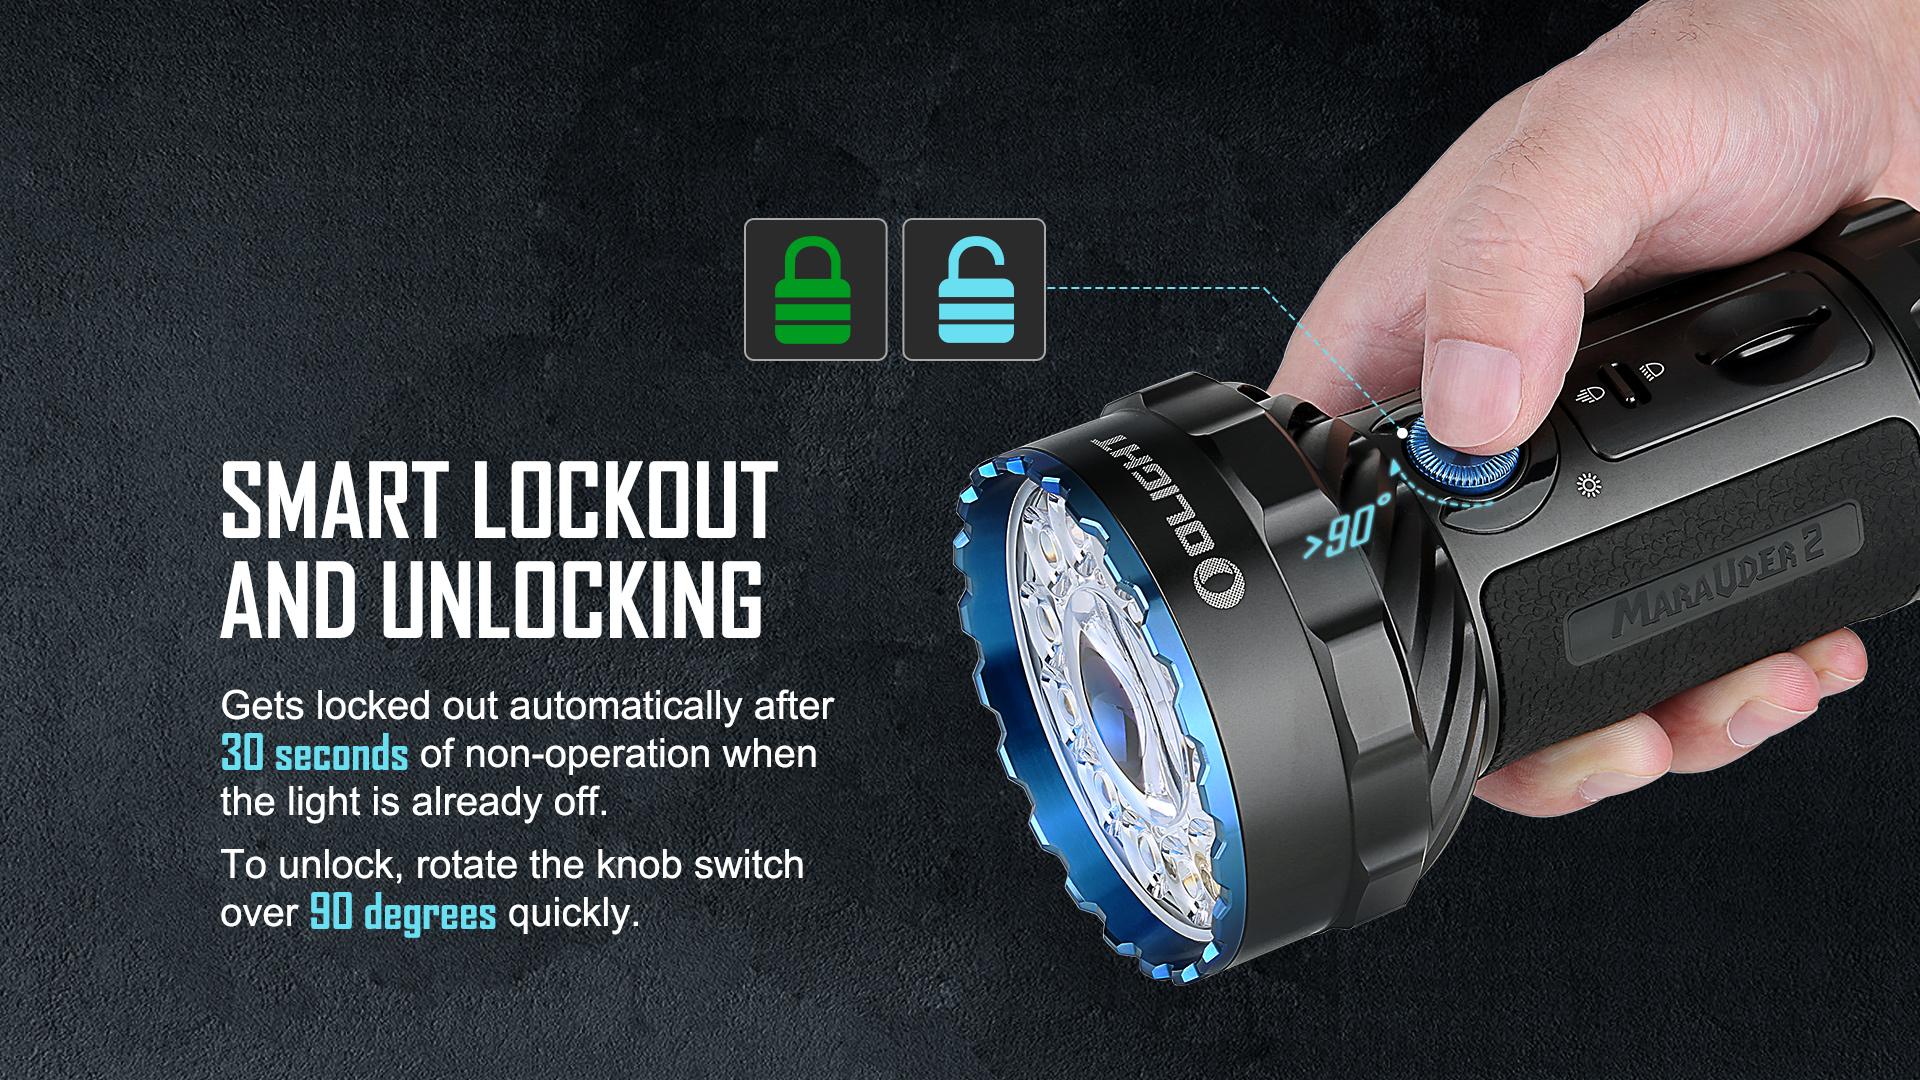 Marauder 2 has smart unlocking and locking